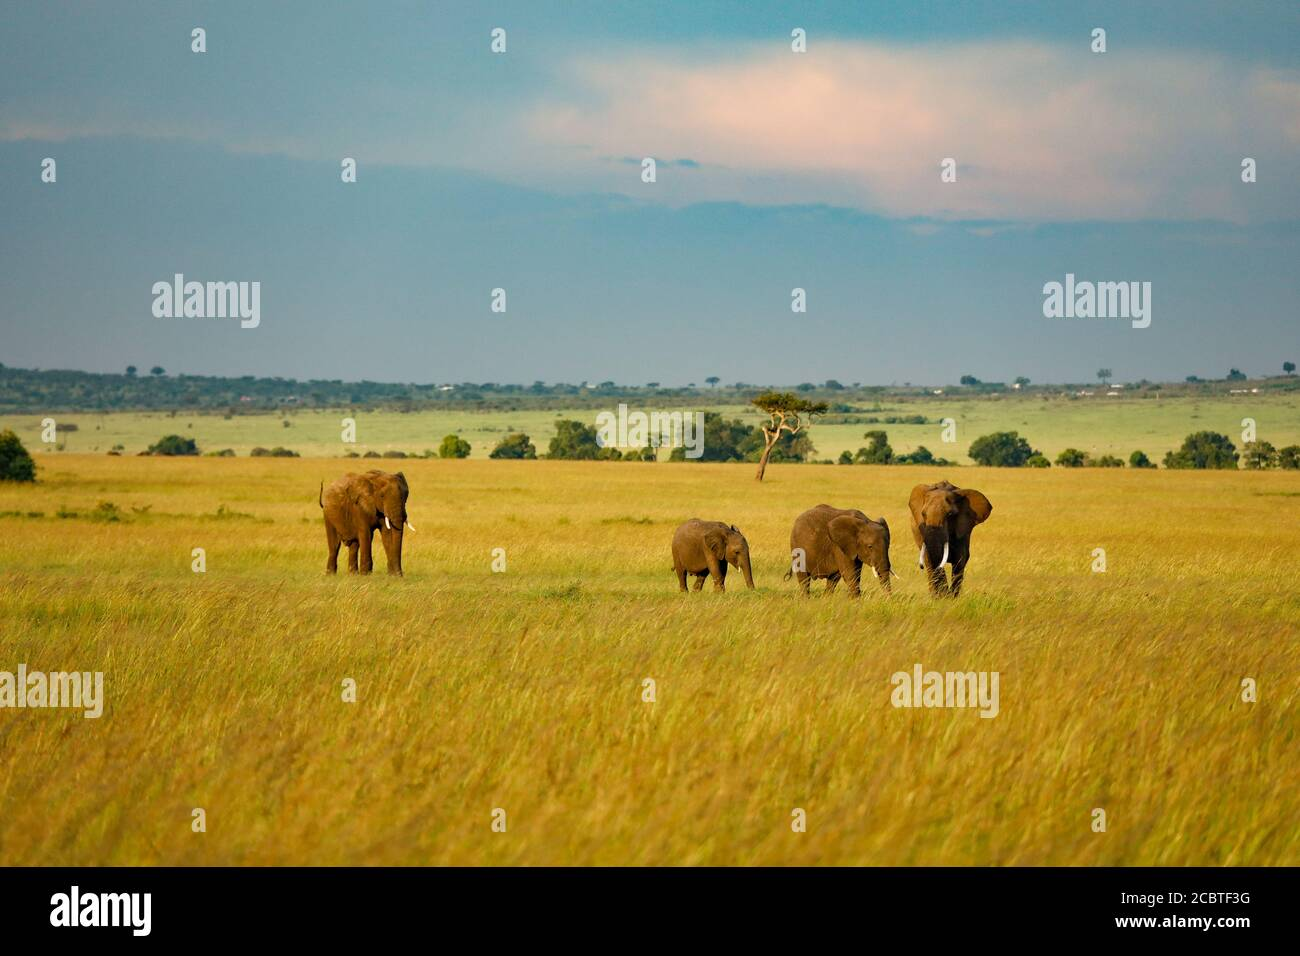 Herd of Elephants Walking Through Grassland in Kenya, Africa Stock Photo